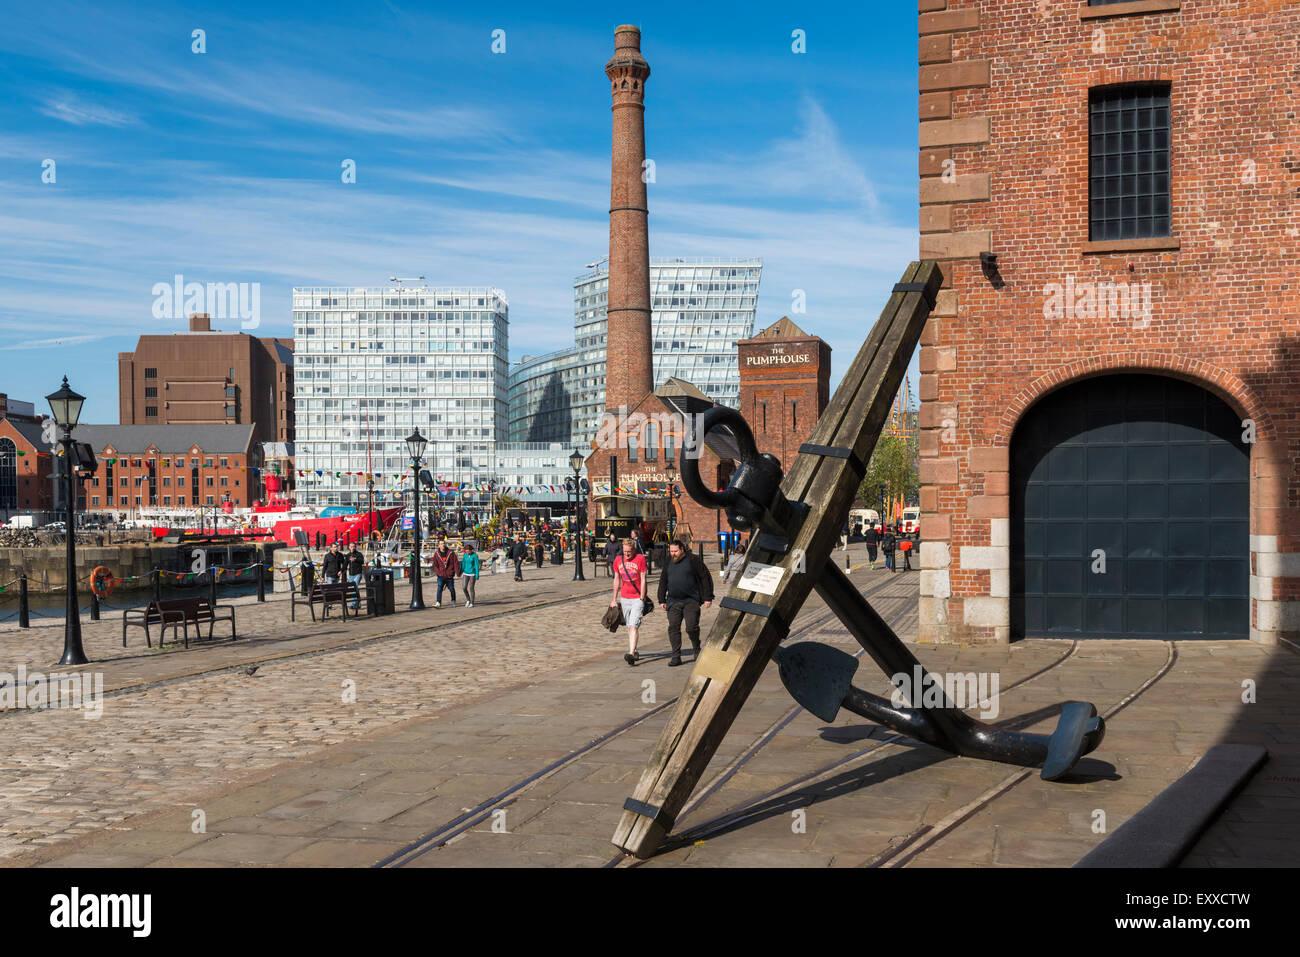 At Albert Dock, Liverpool, Merseyside, England, UK - Stock Image